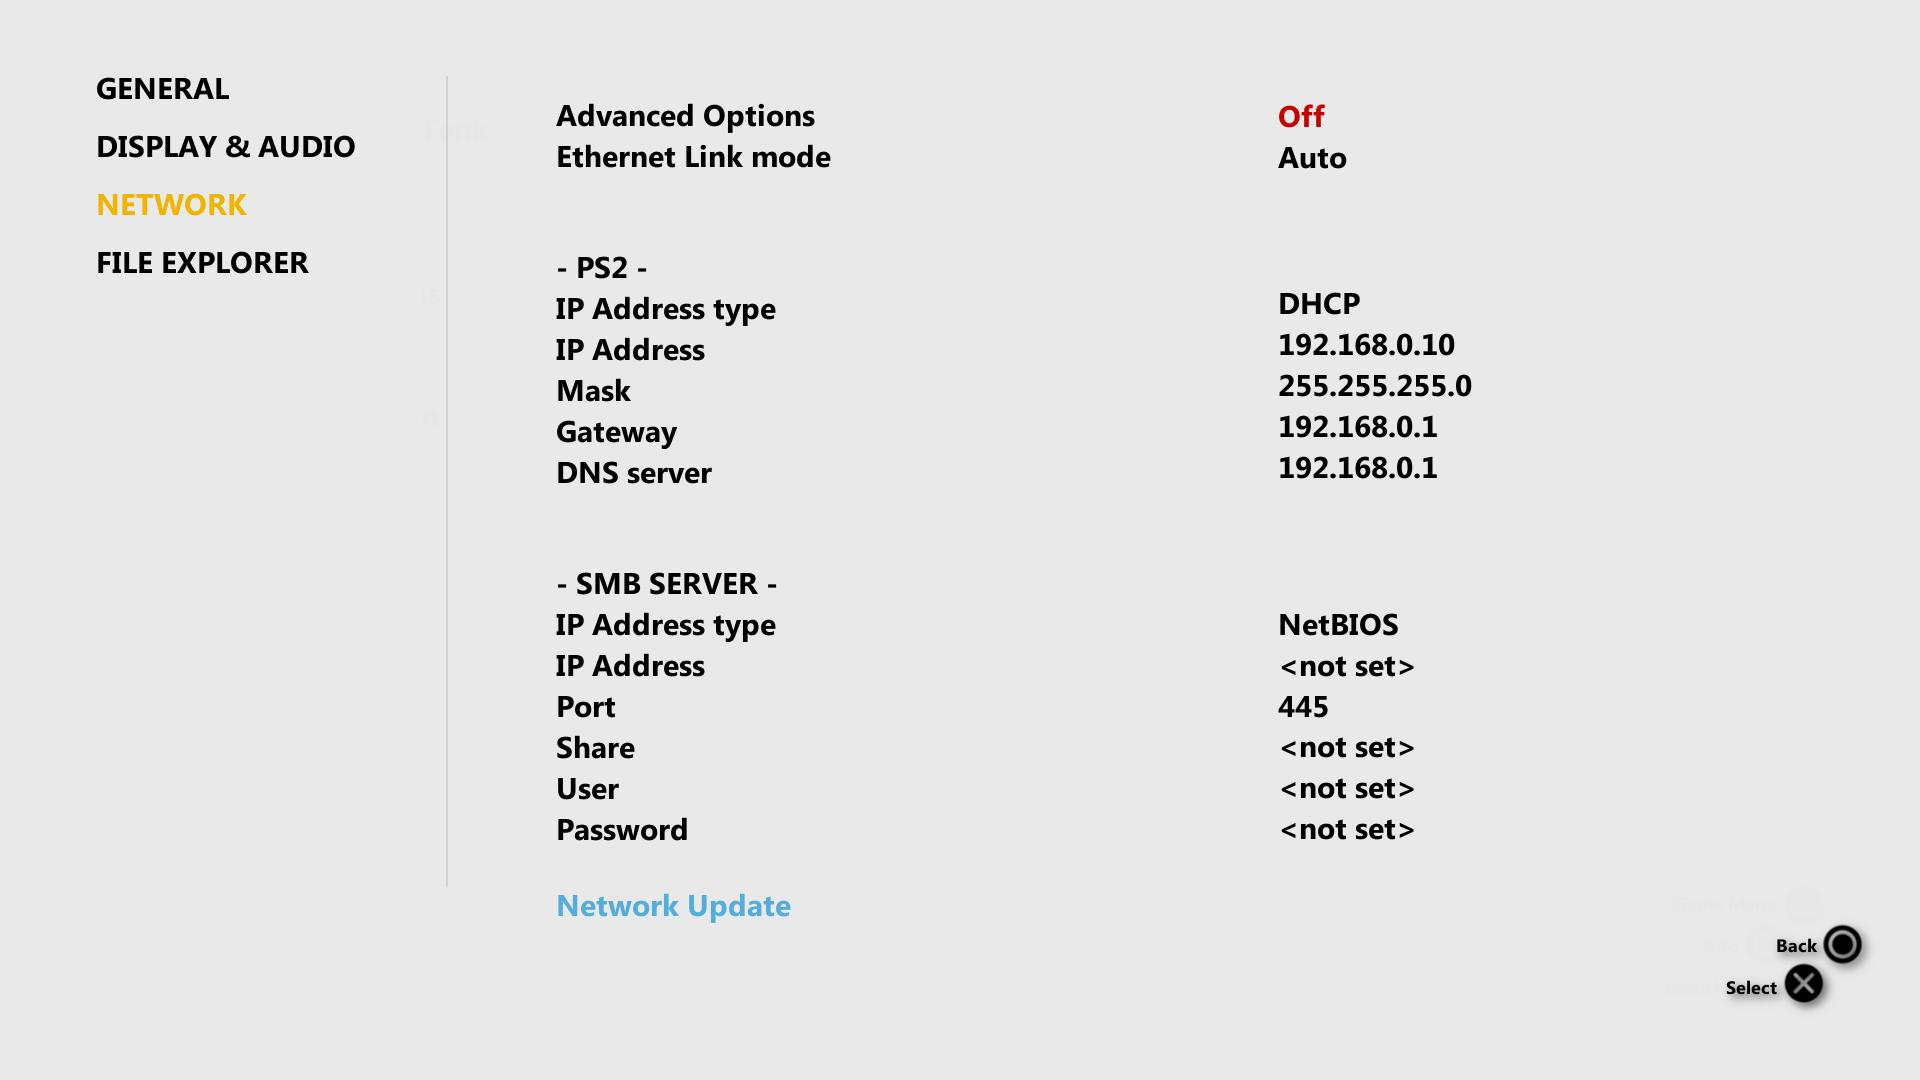 3-OPL-NETWORK-SETTINGS.png